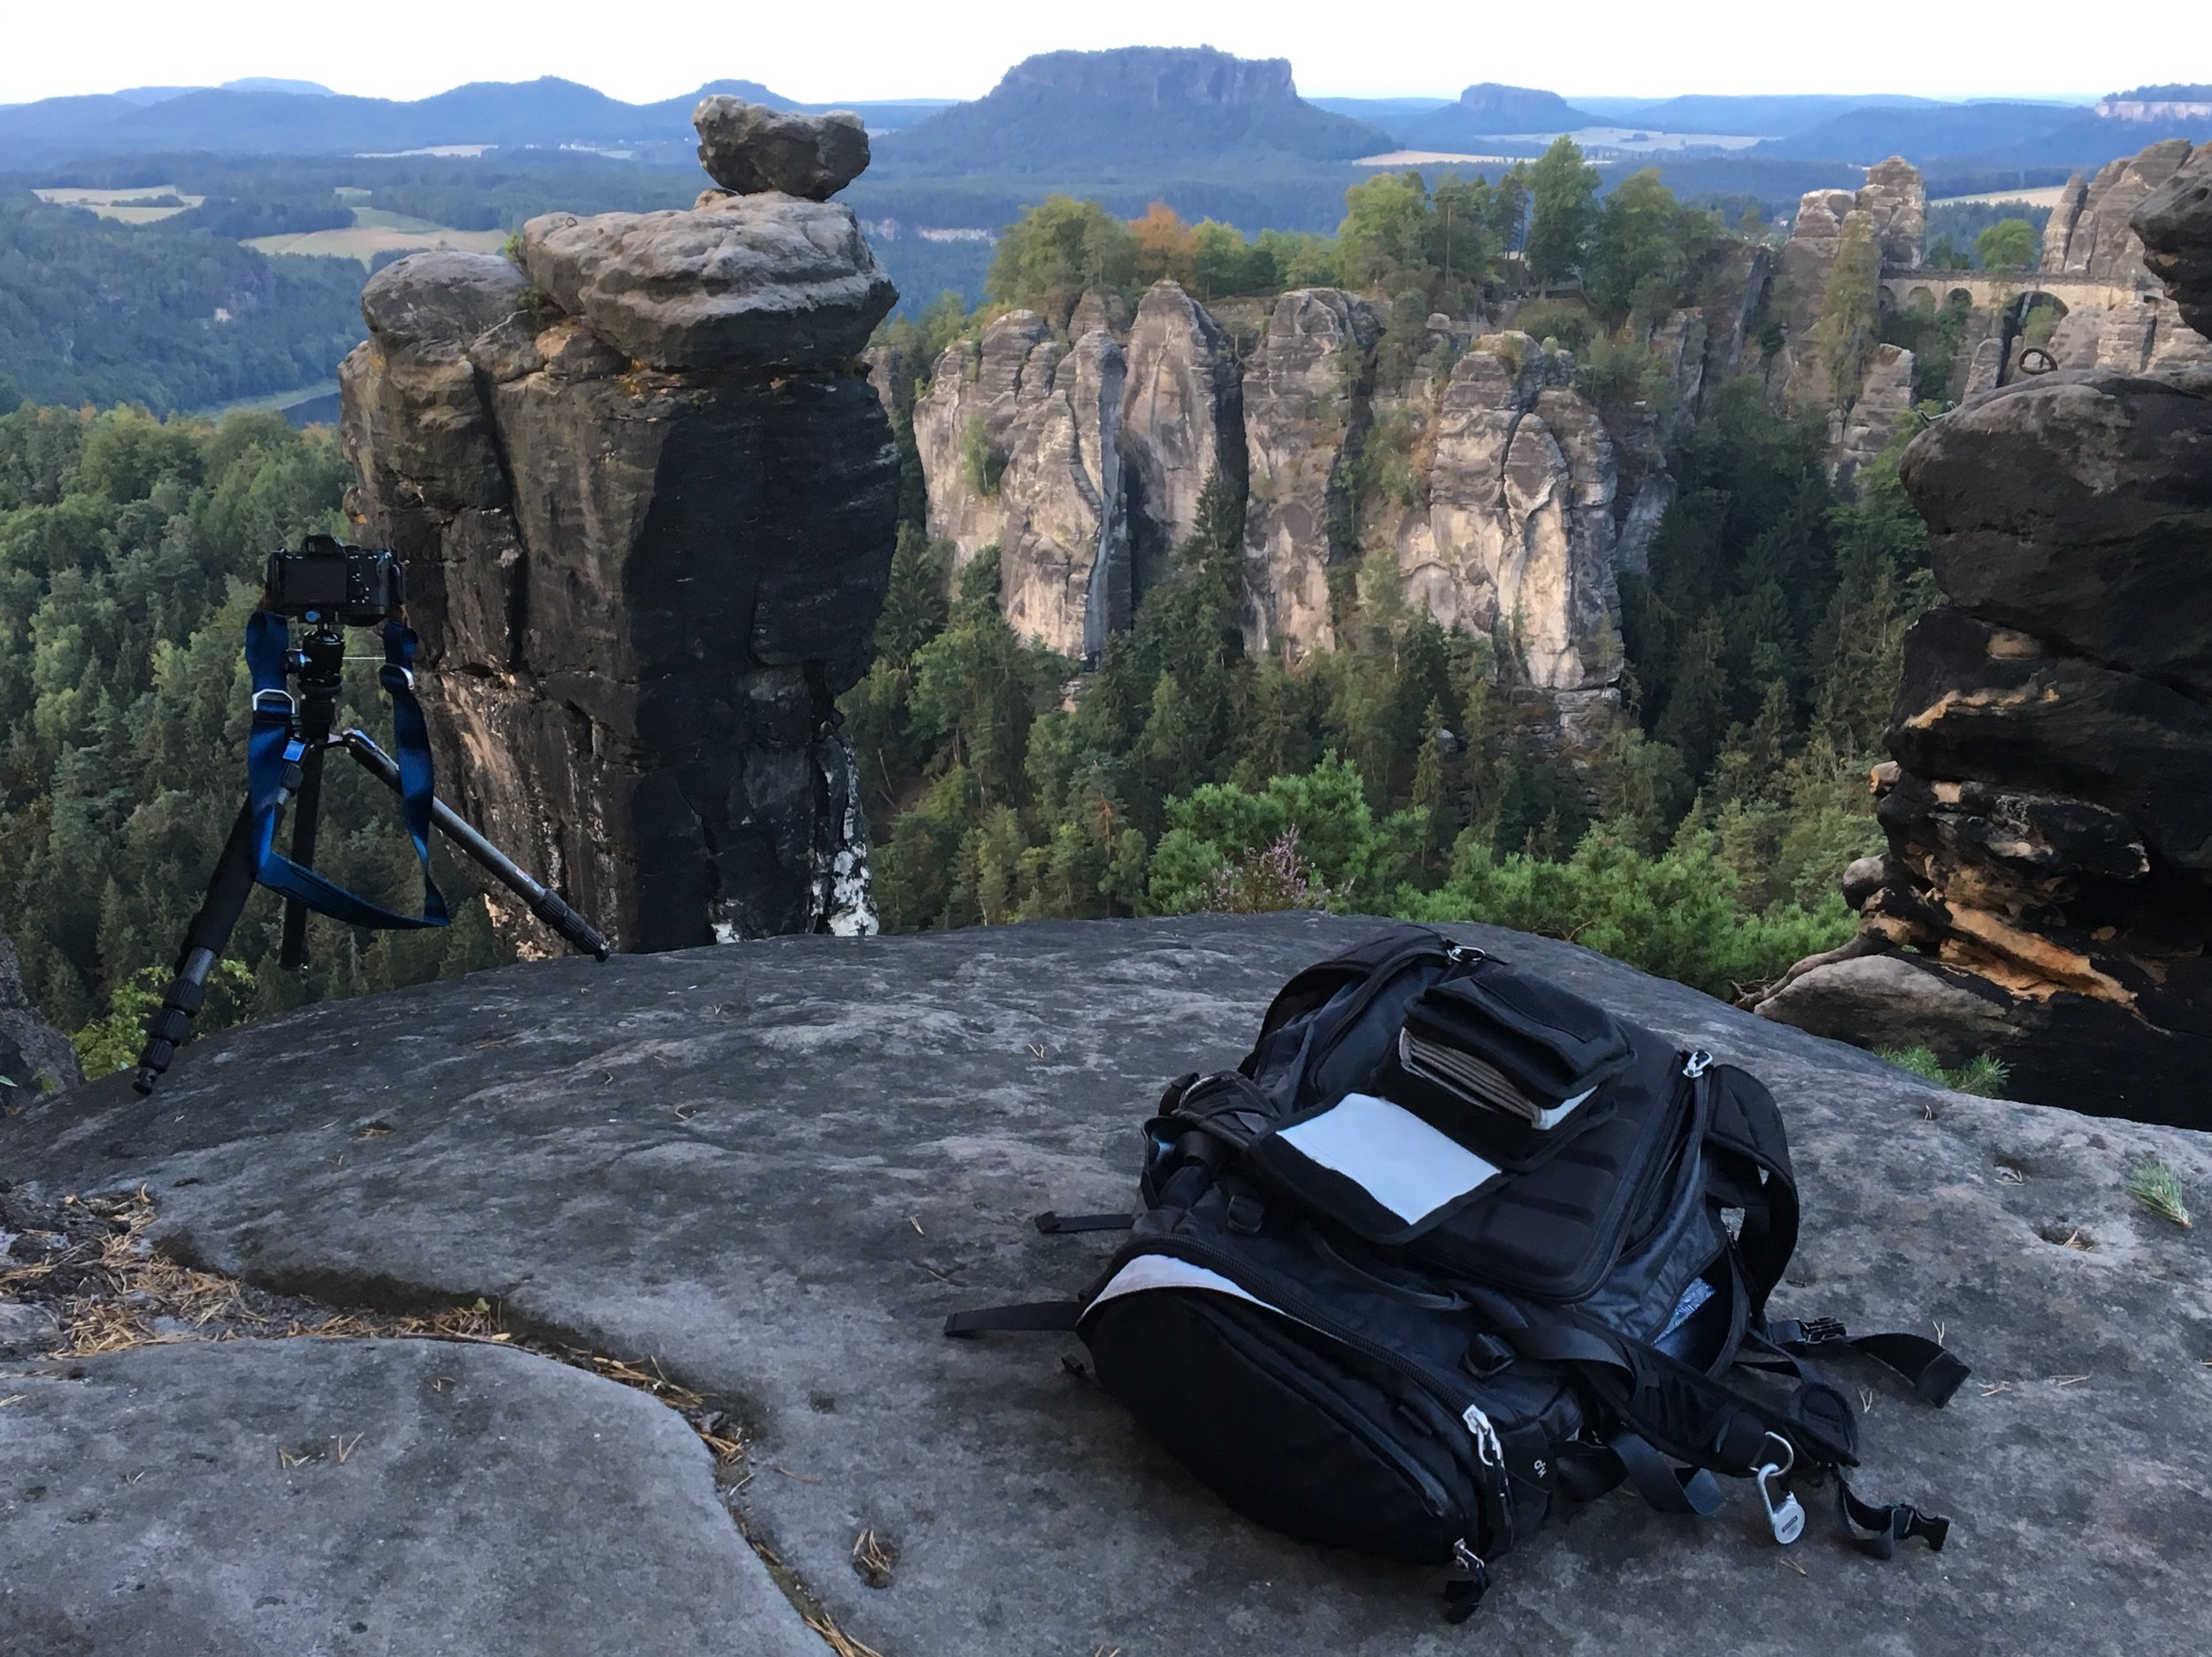 on set at Elbsandsteingebirge